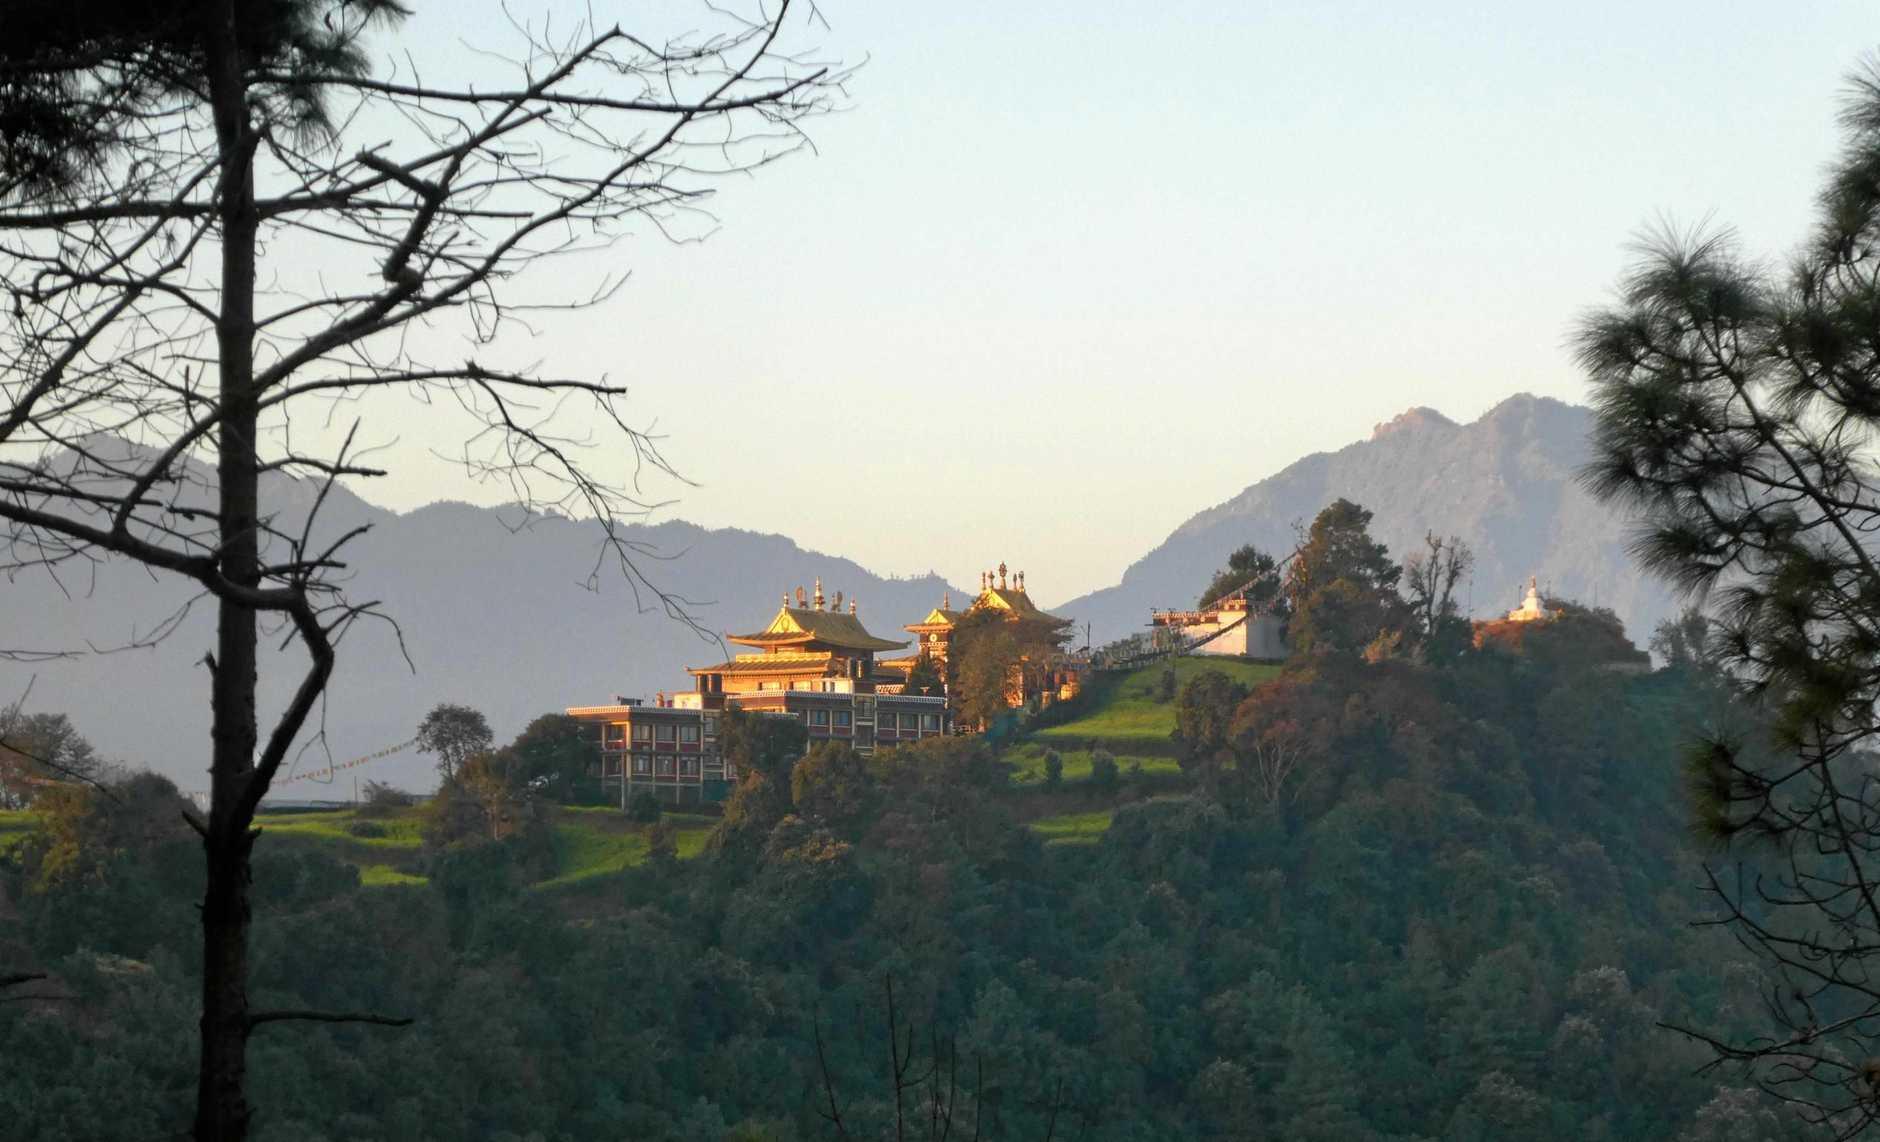 Buddhist monestry Namo Buddha which is two hours drive from Kathmandu